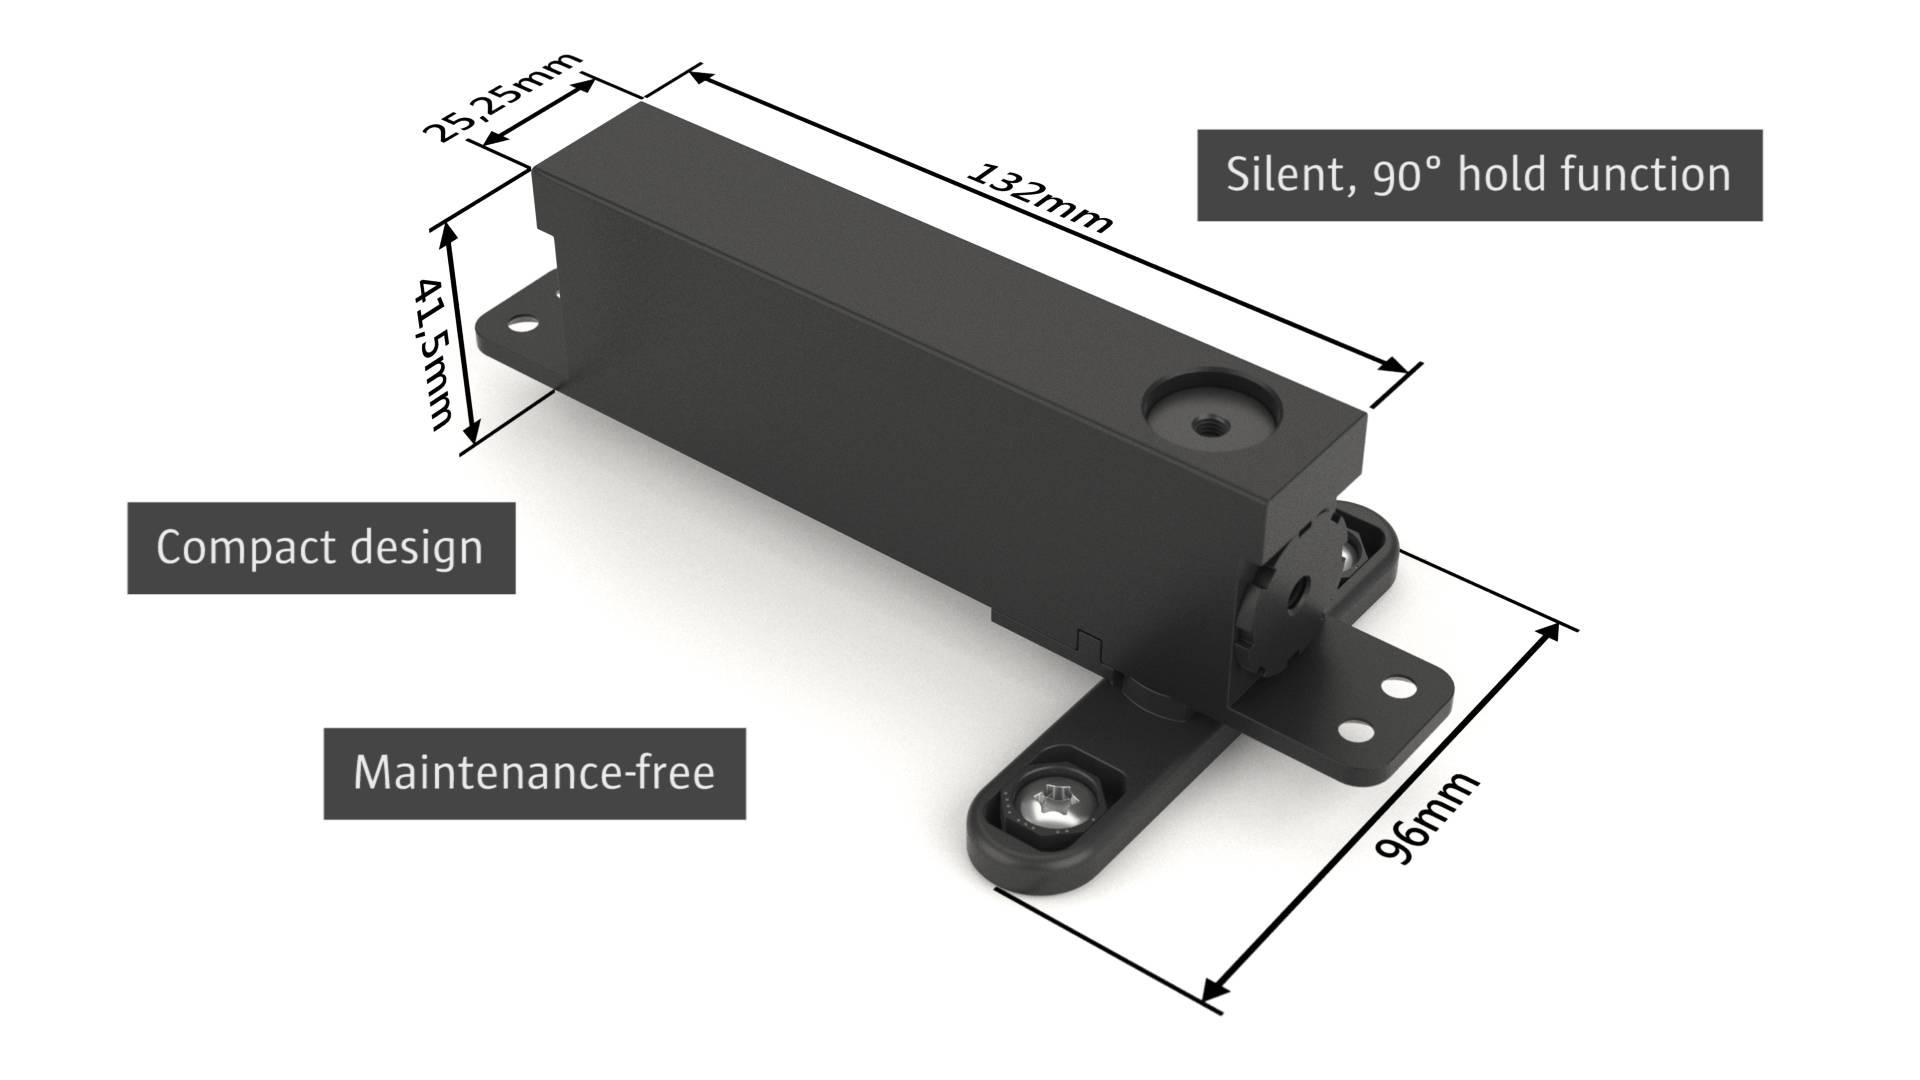 Stealth Pivot NL compact self-closing pivot hinge